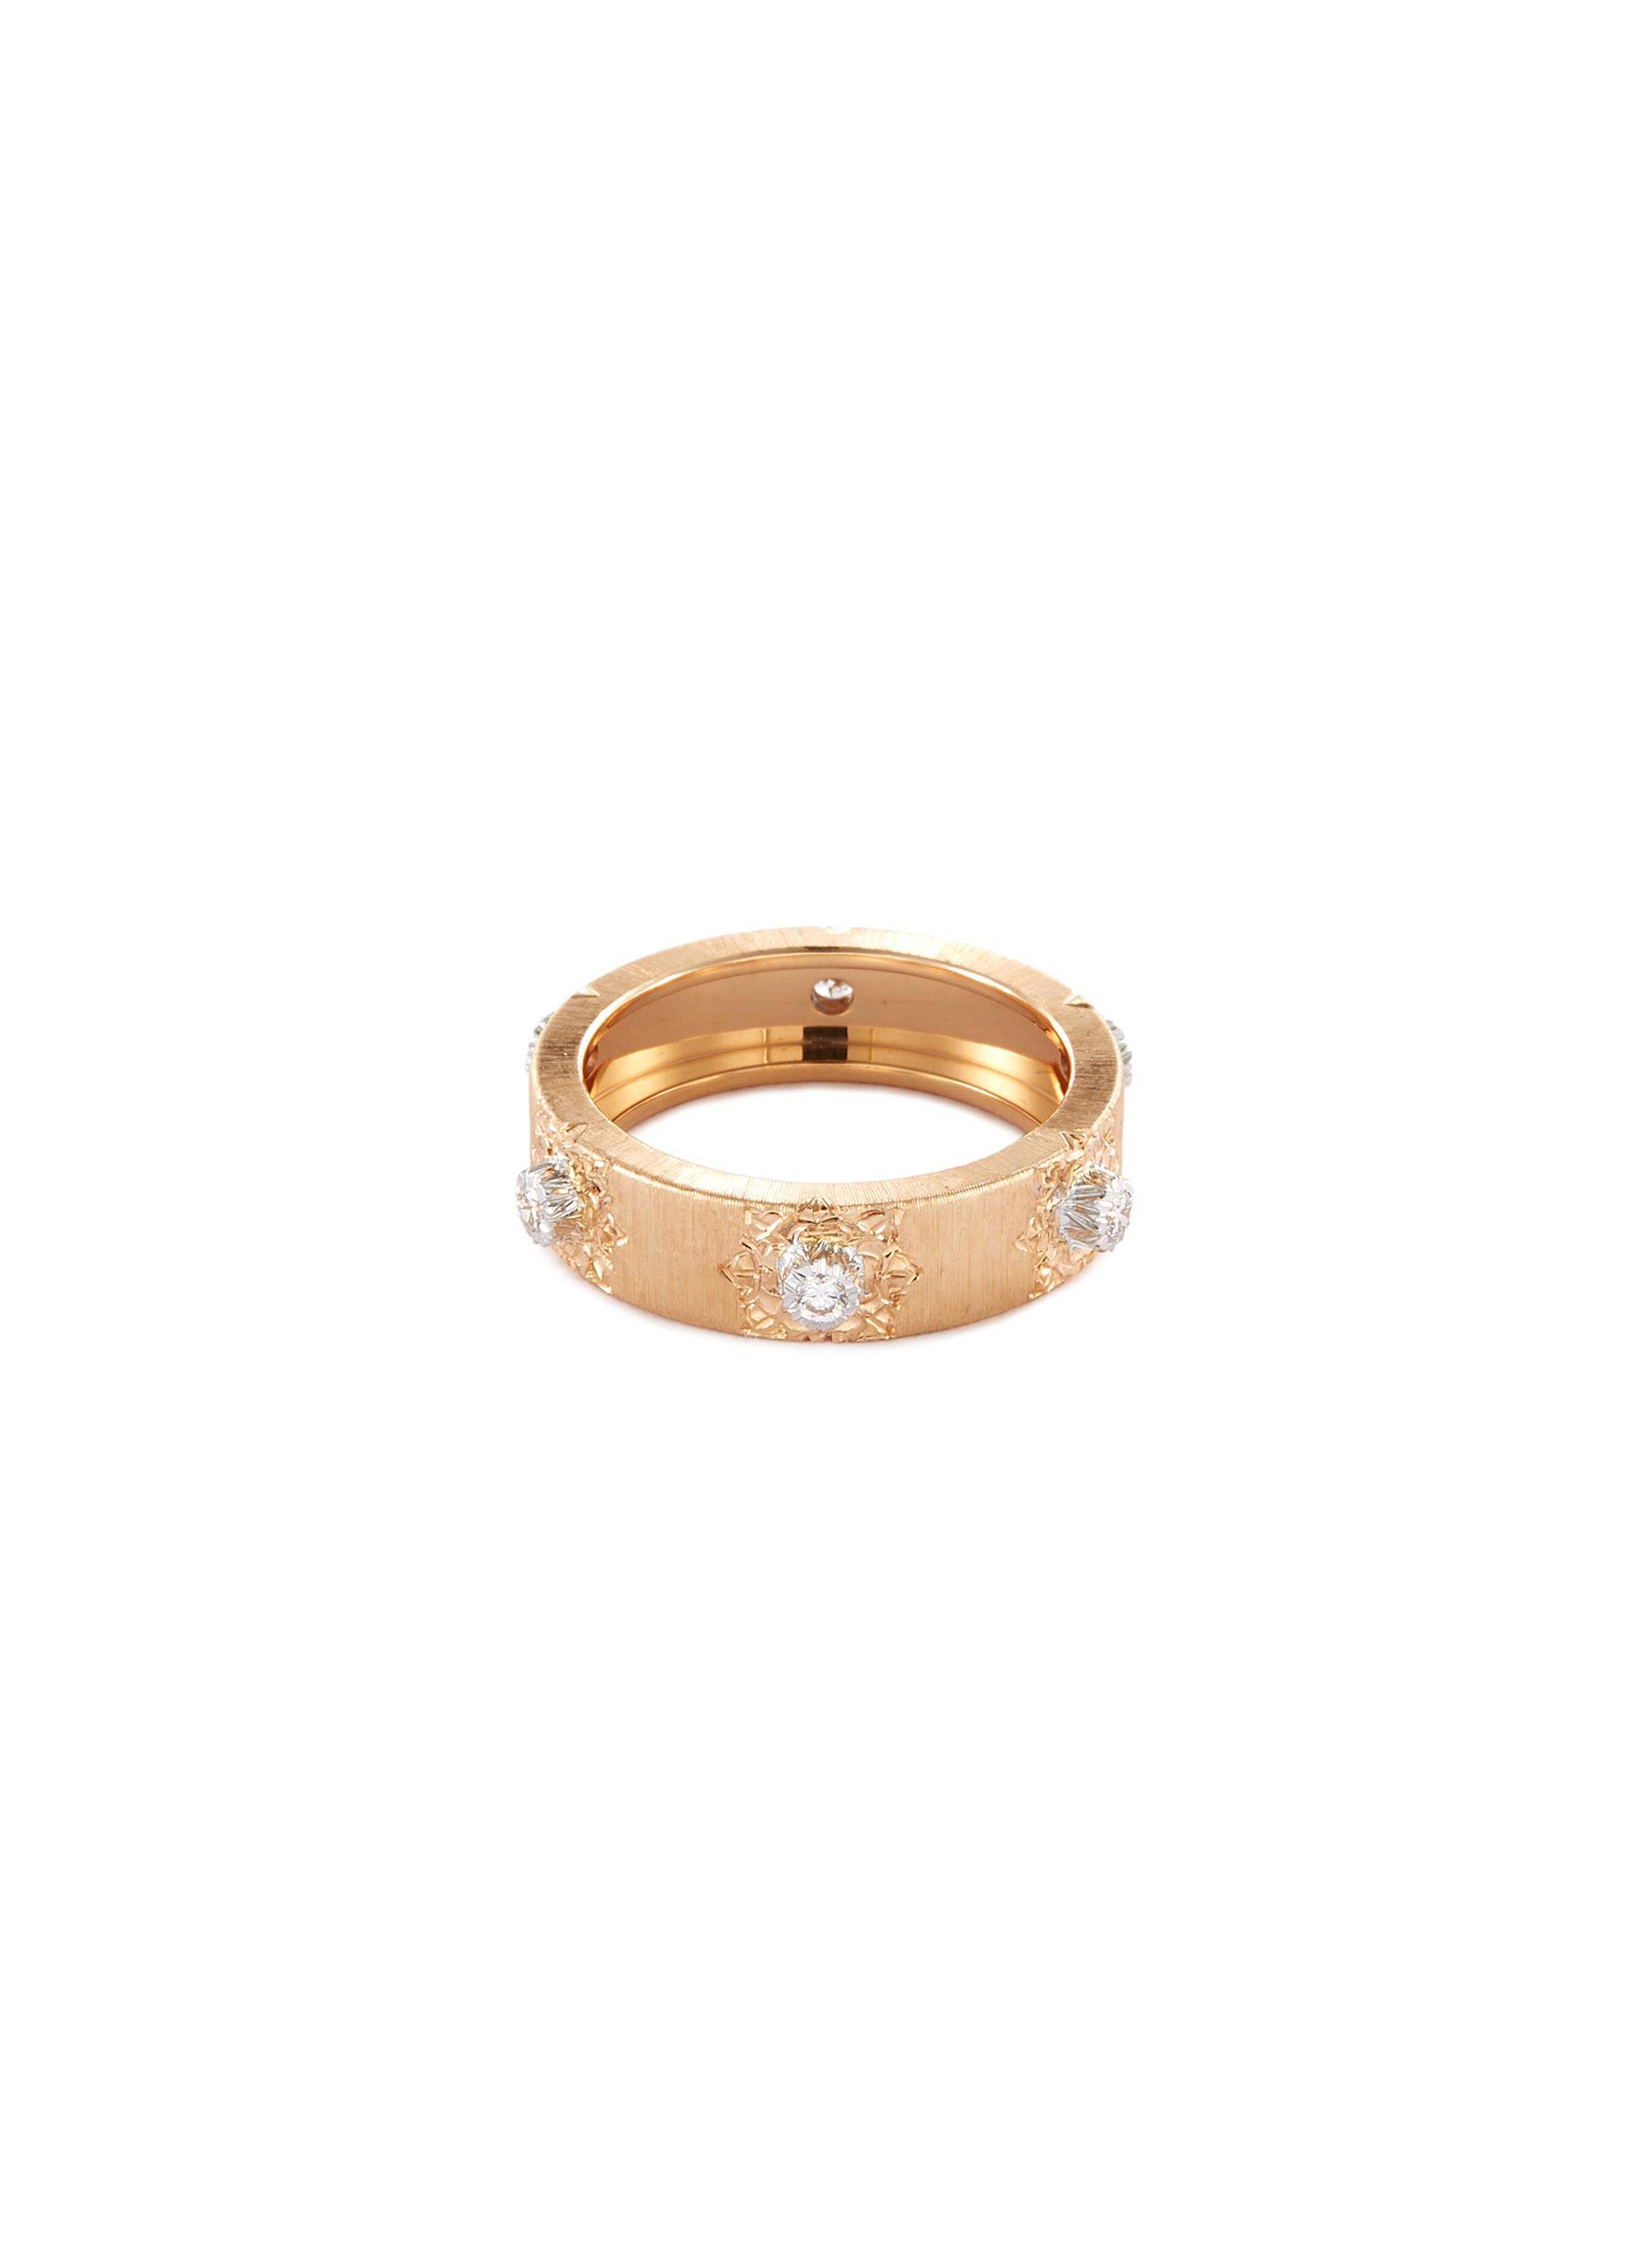 Macri' diamond gold ring - BUCCELLATI - Modalova